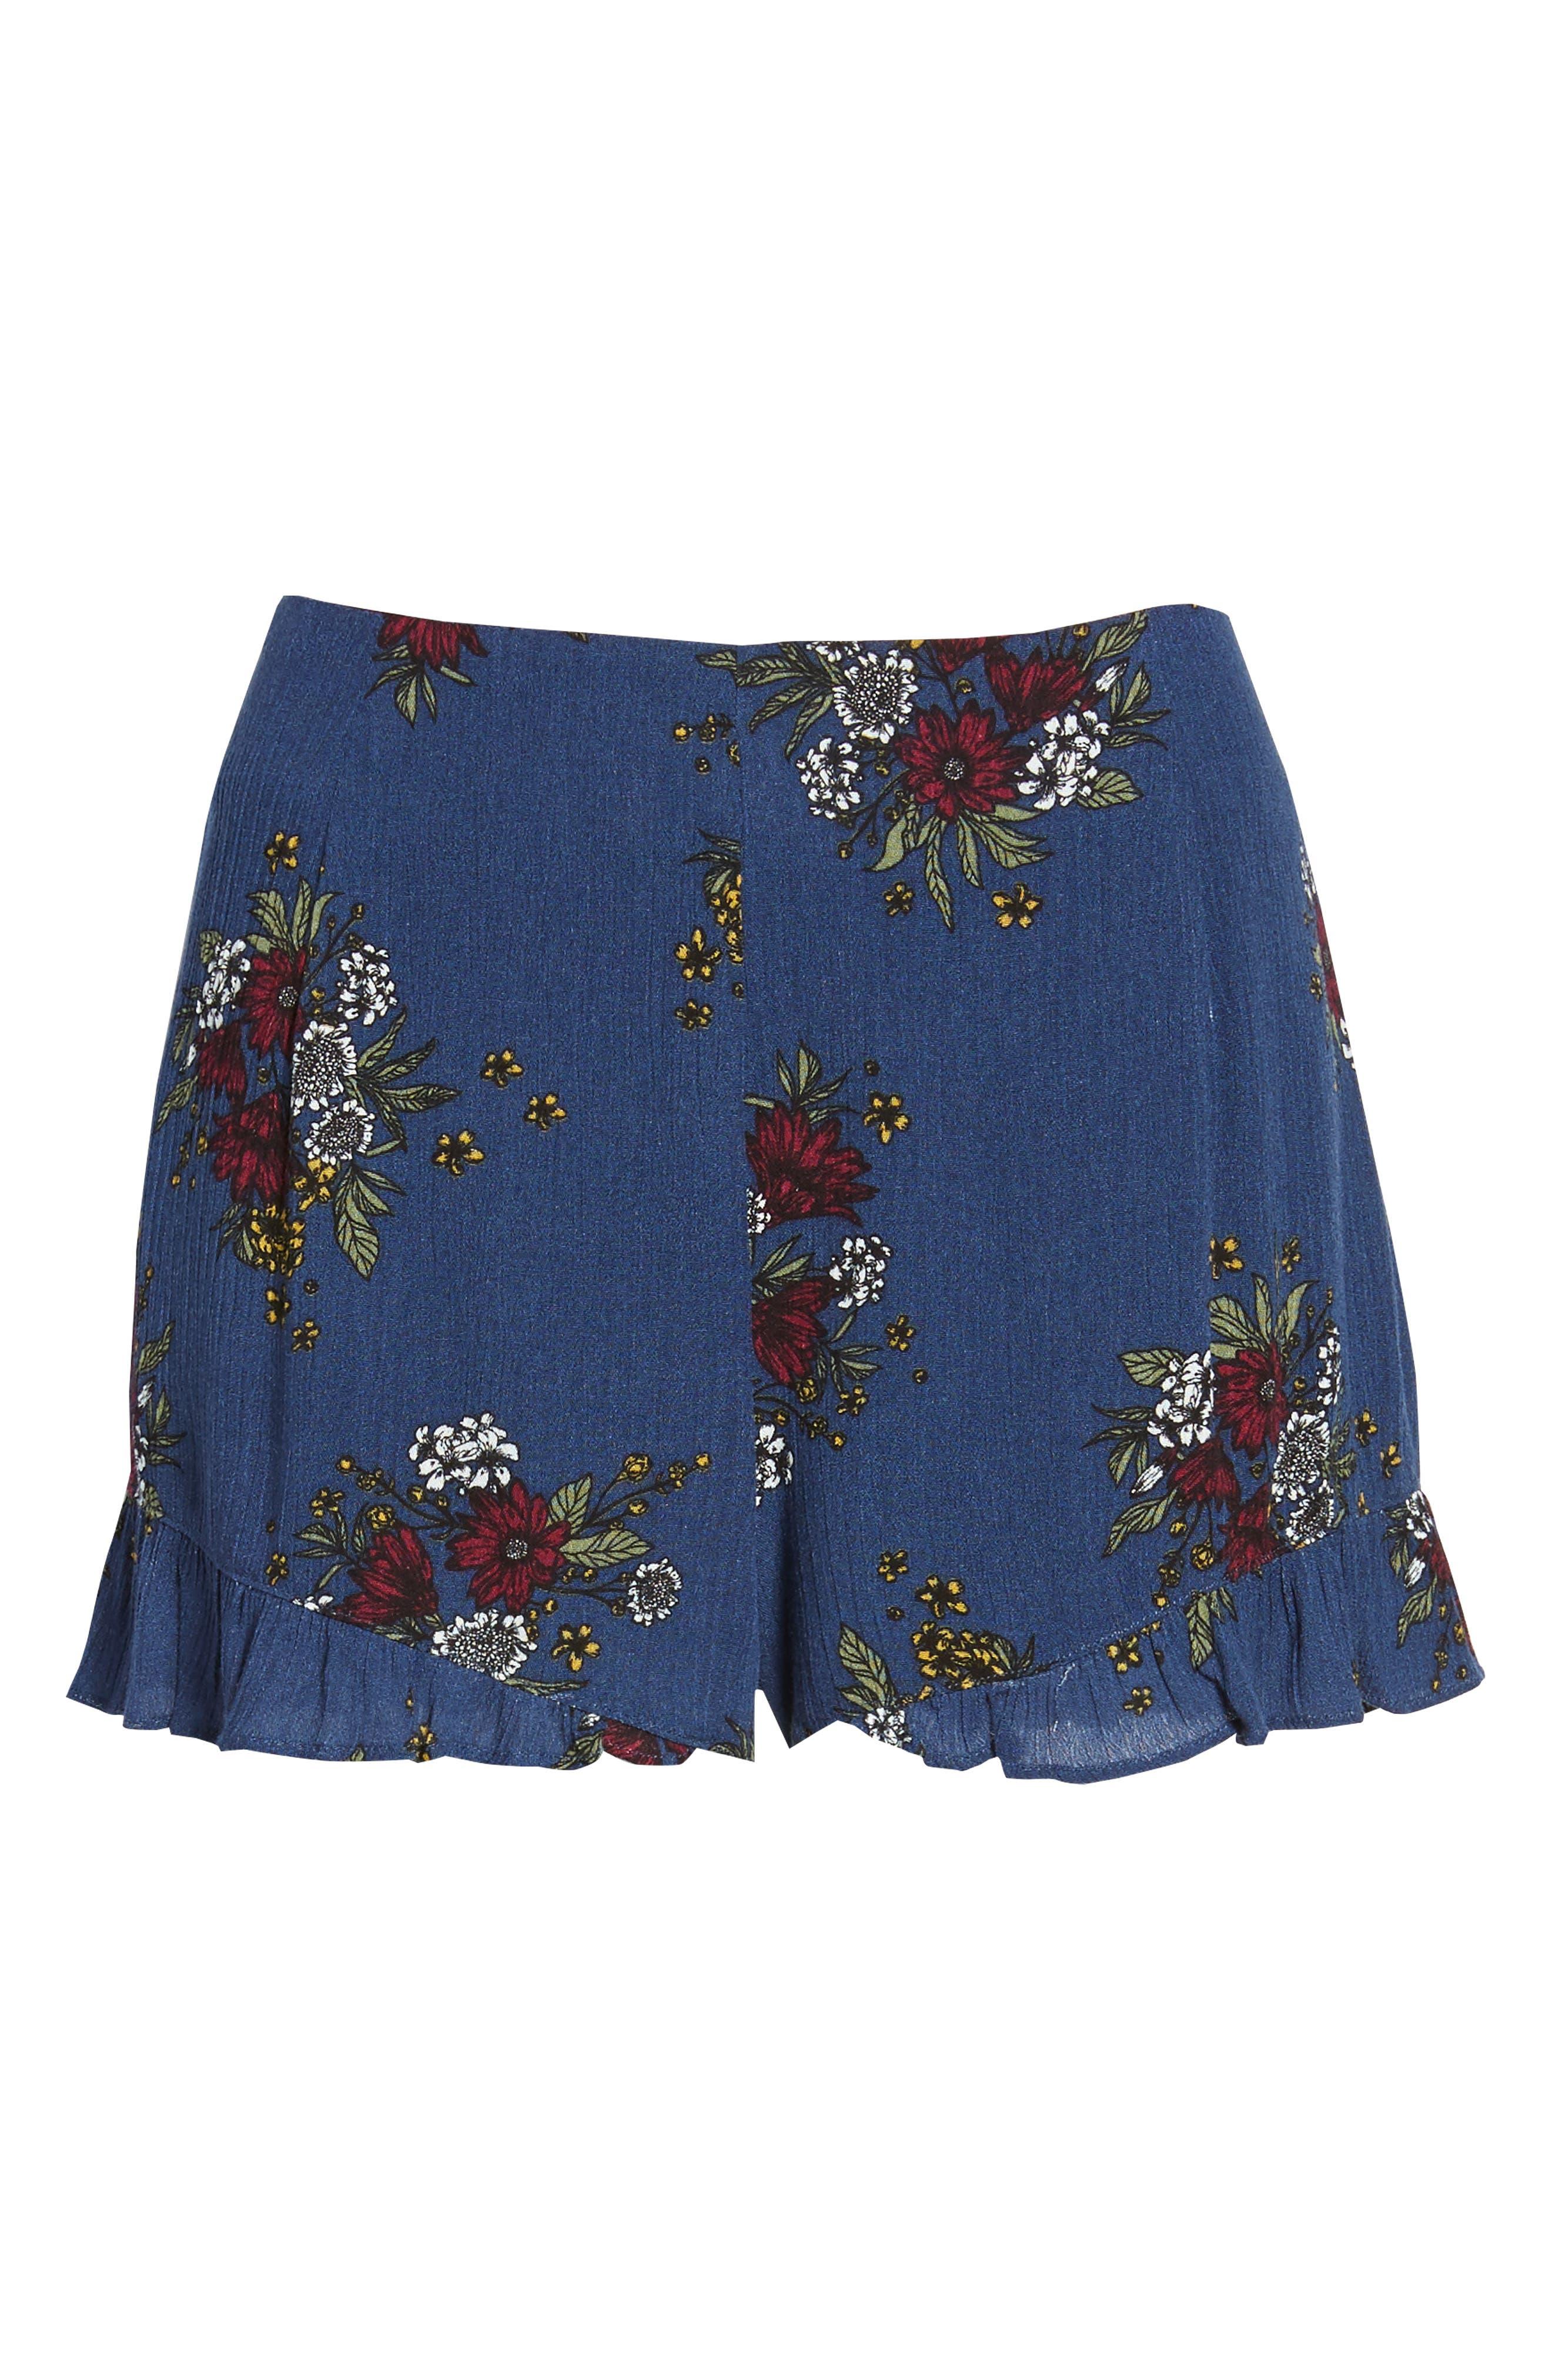 Theia Floral Ruffle Hem Shorts,                             Alternate thumbnail 6, color,                             Navy